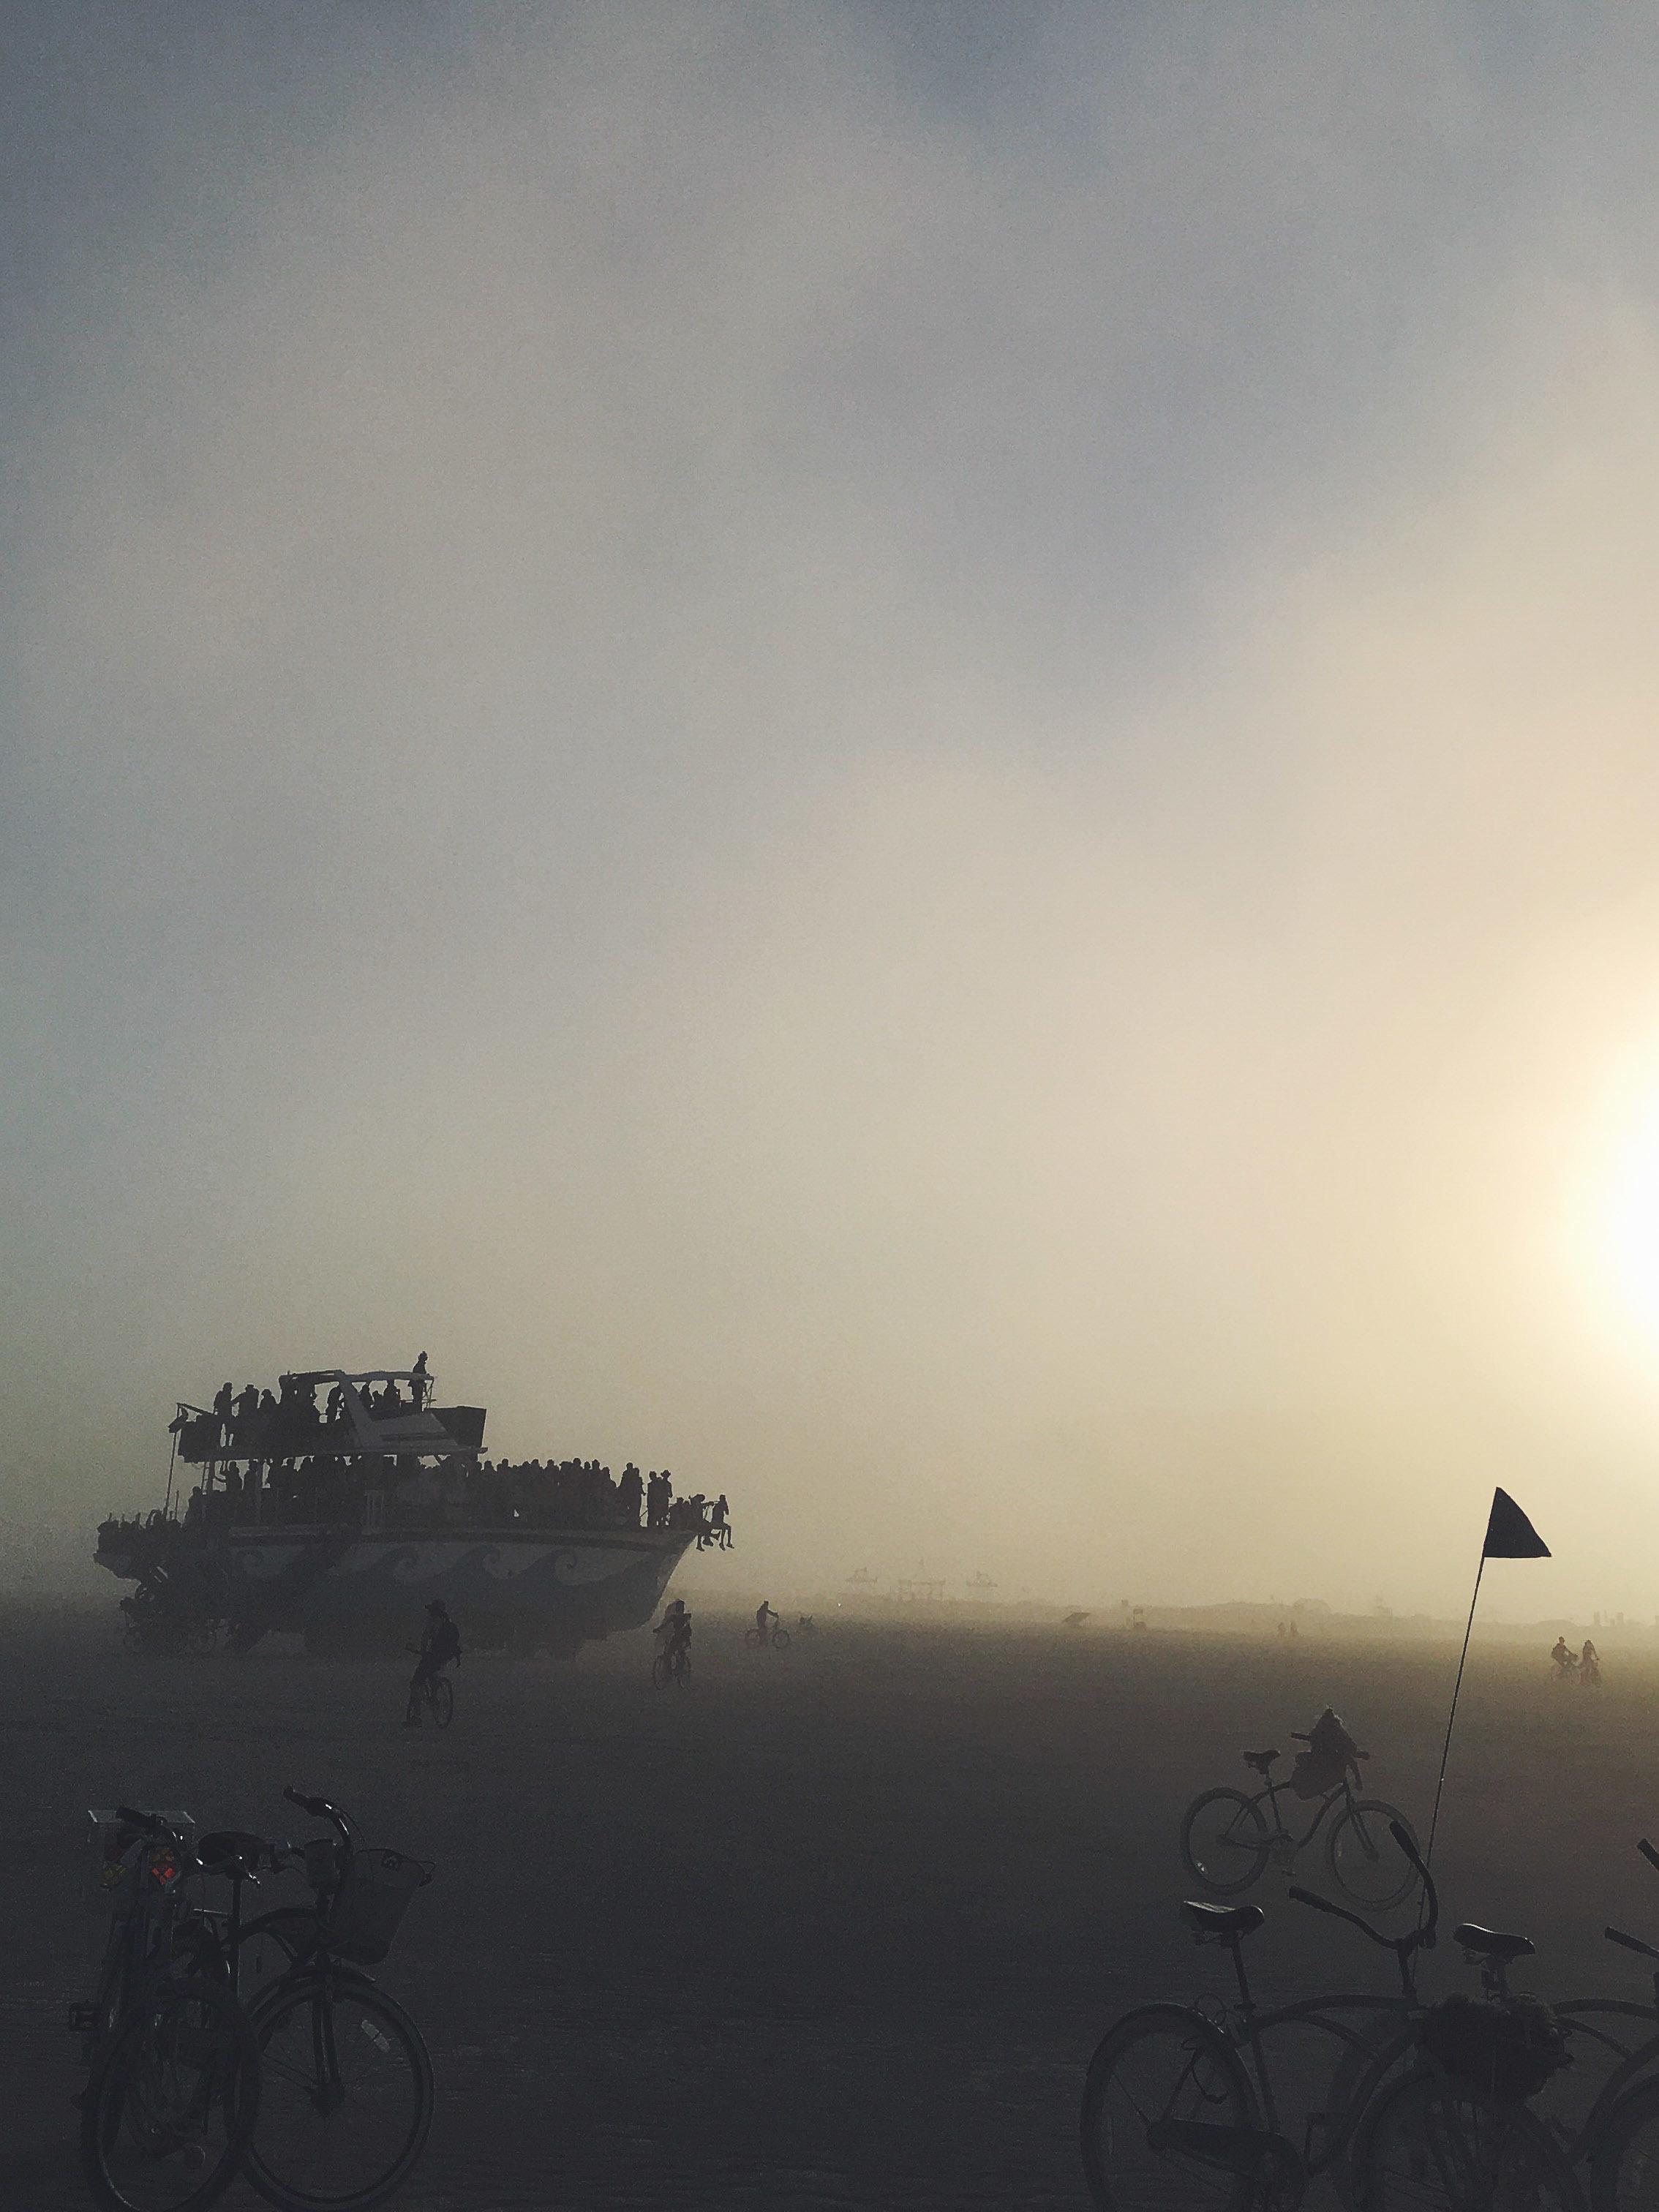 Federal Clampdown On Burning Man Imperils Festival's Free Spirit Ethos, Say Burners